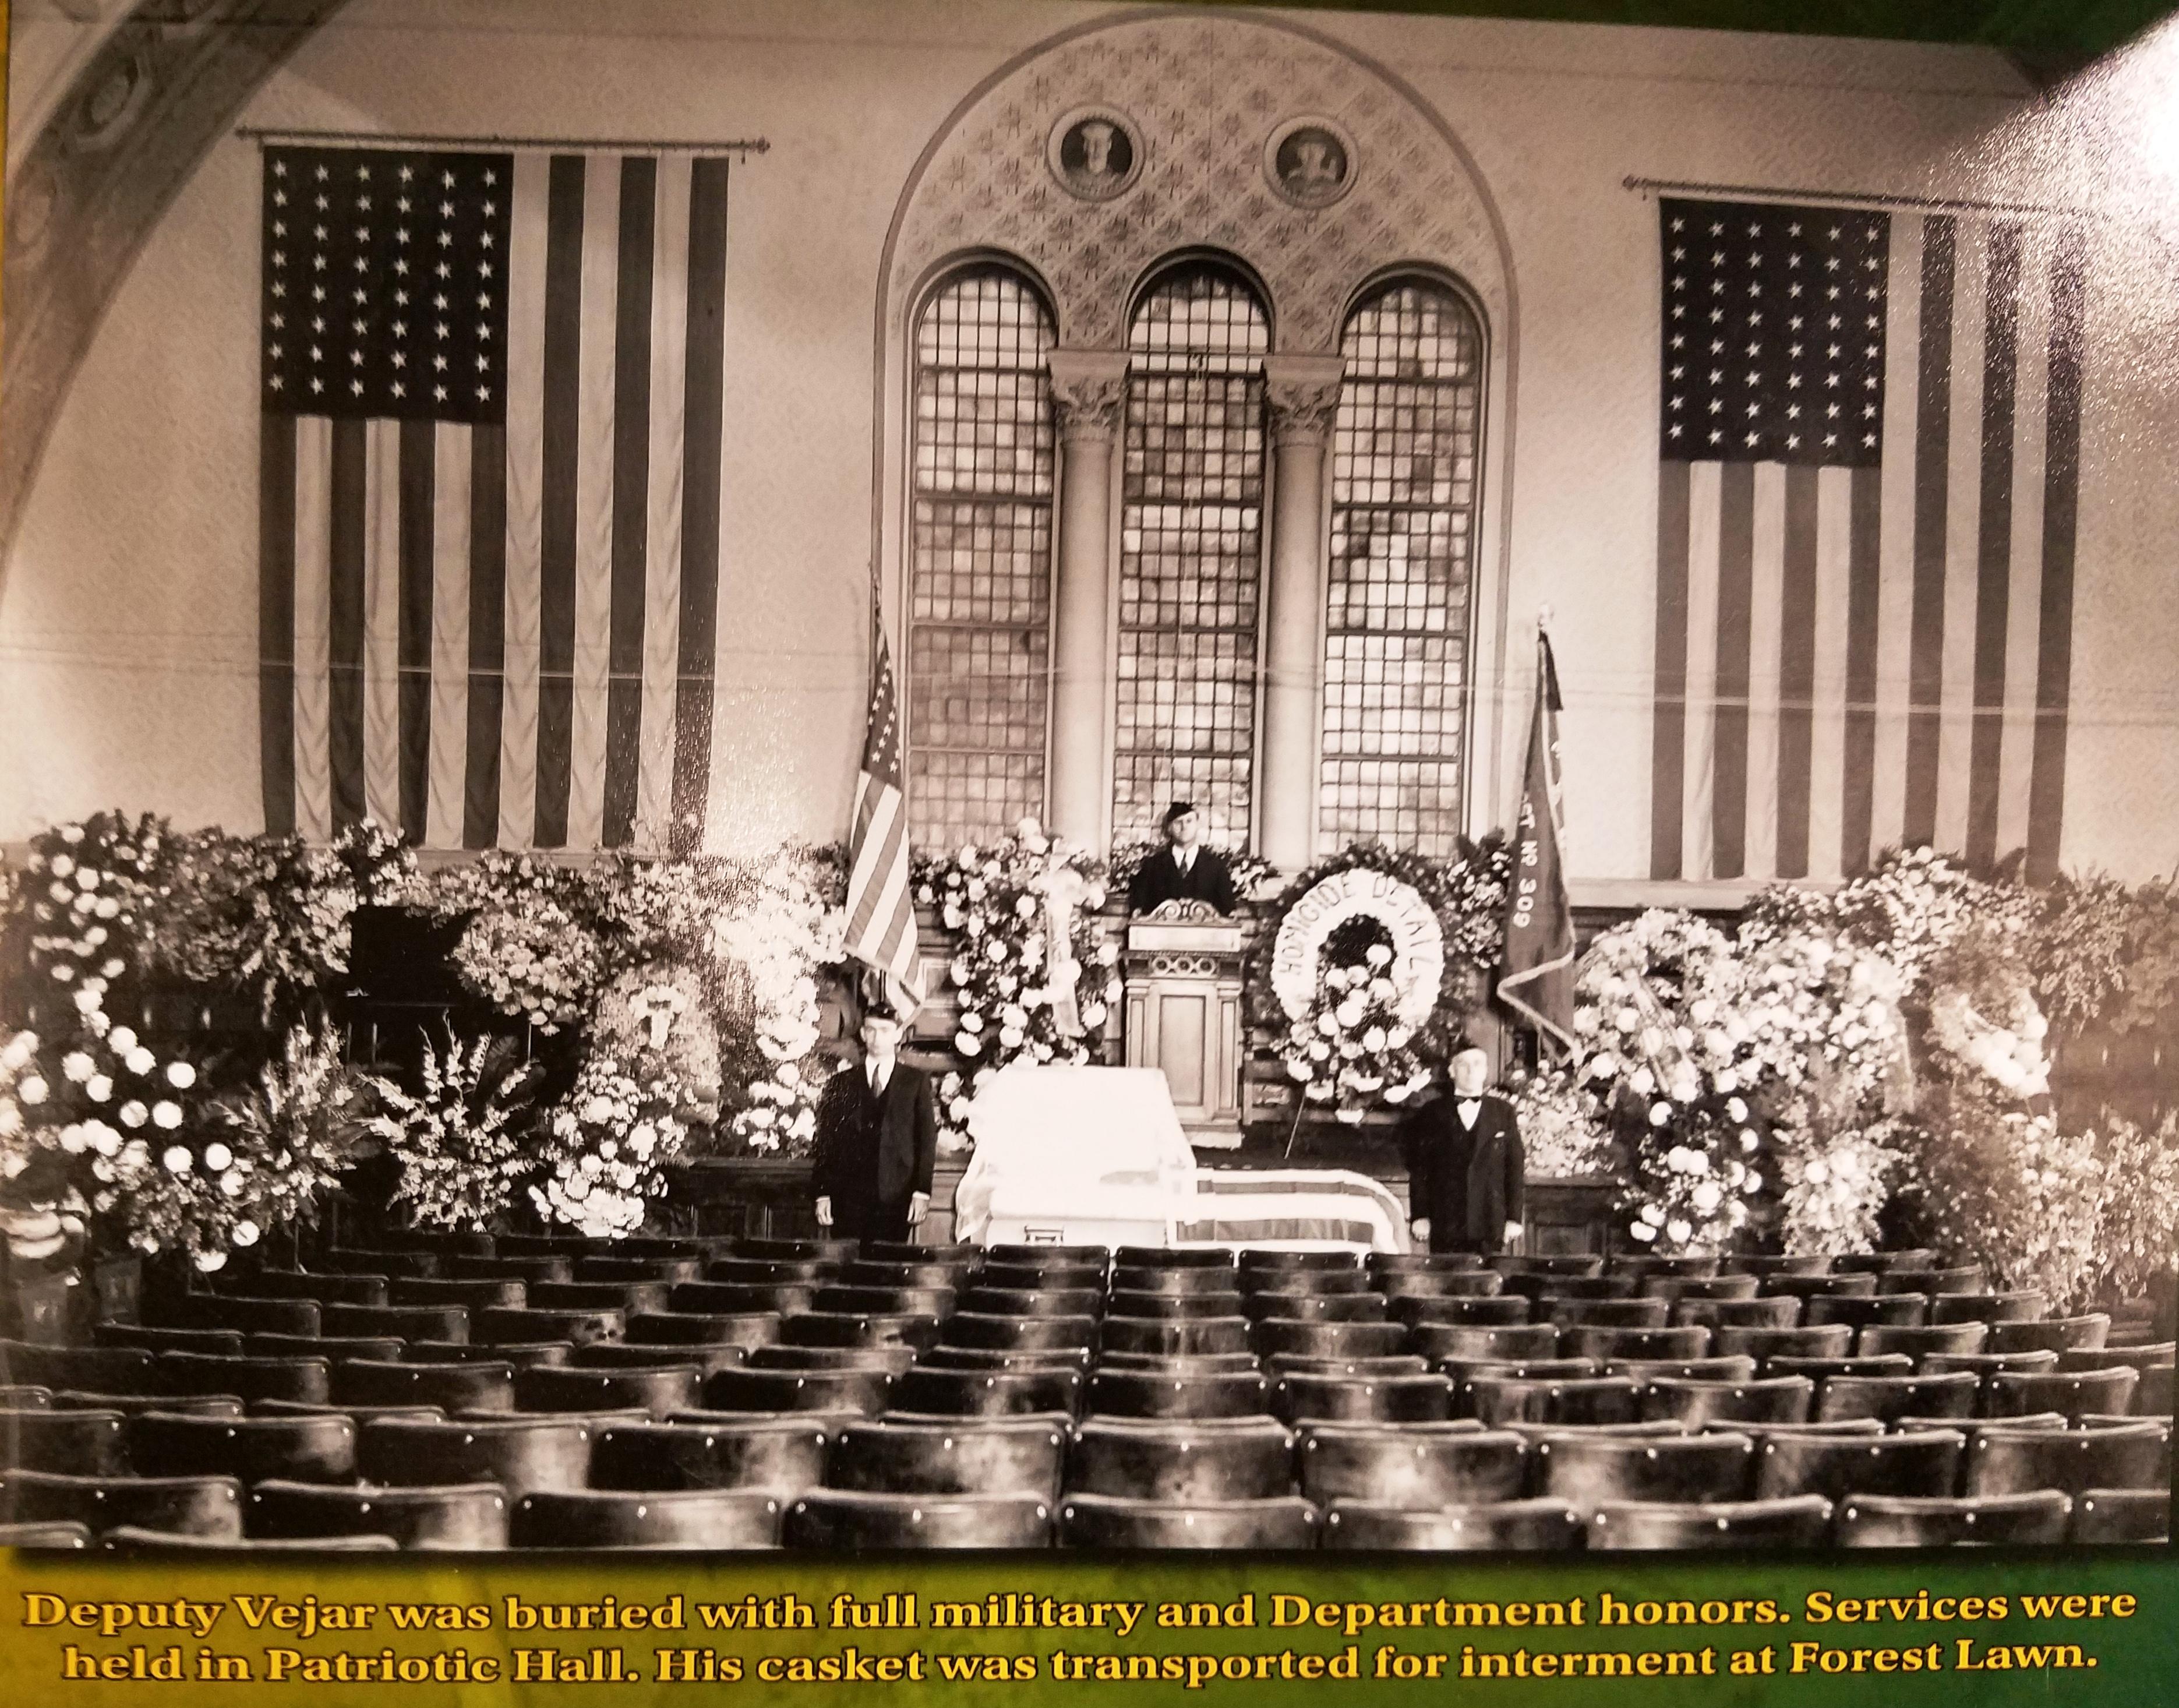 RG Vejar Funeral at Patriotic Hall